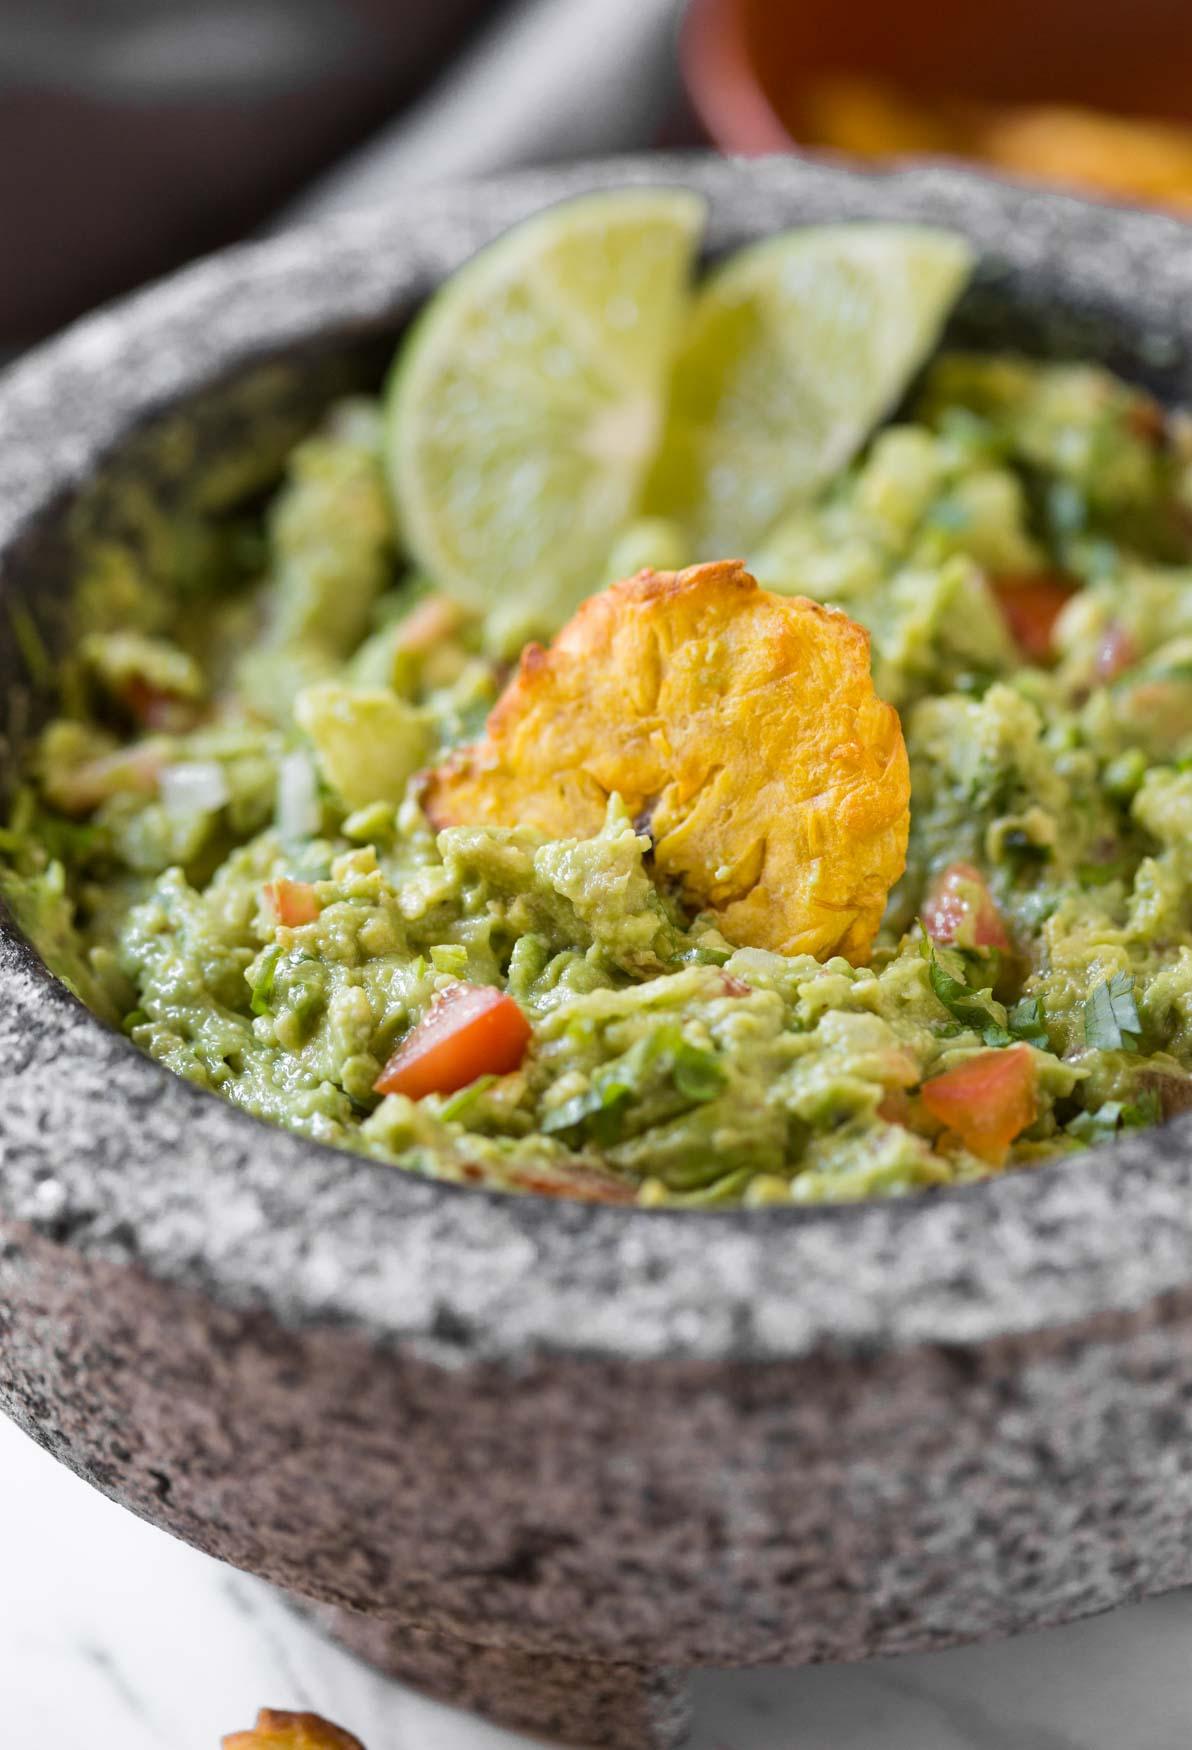 Best Ever Homemade Simple Healthy Guacamole Recipe